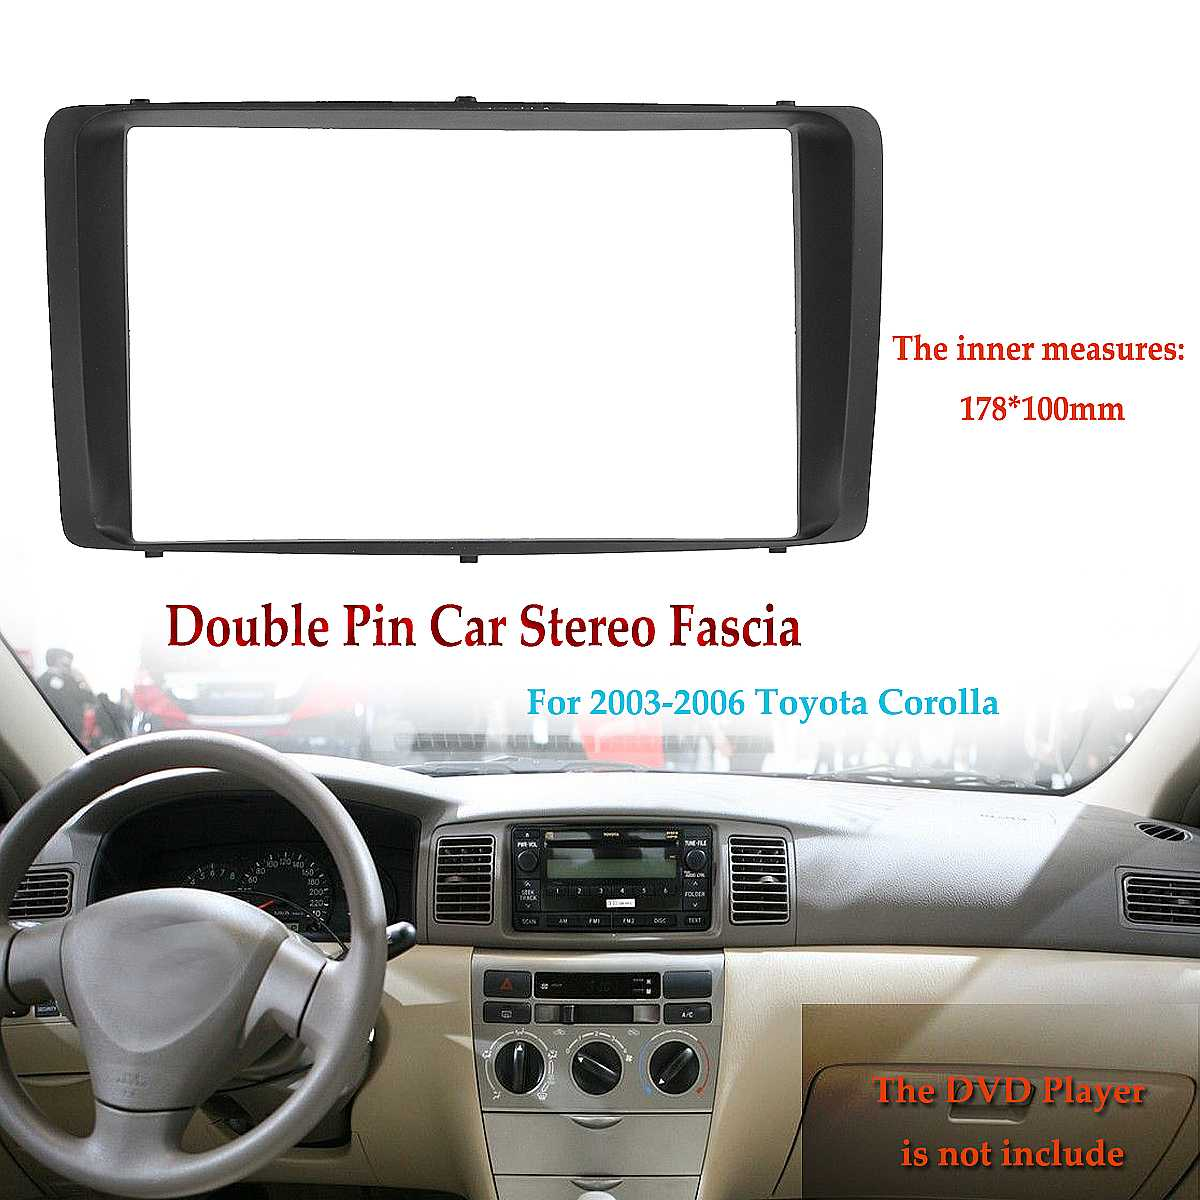 2 din 자동차 스테레오 라디오 오디오 dvd cd fascia plate 패널 프레임 대시 보드 교체 toyota corolla 2003 2004 2005 2006